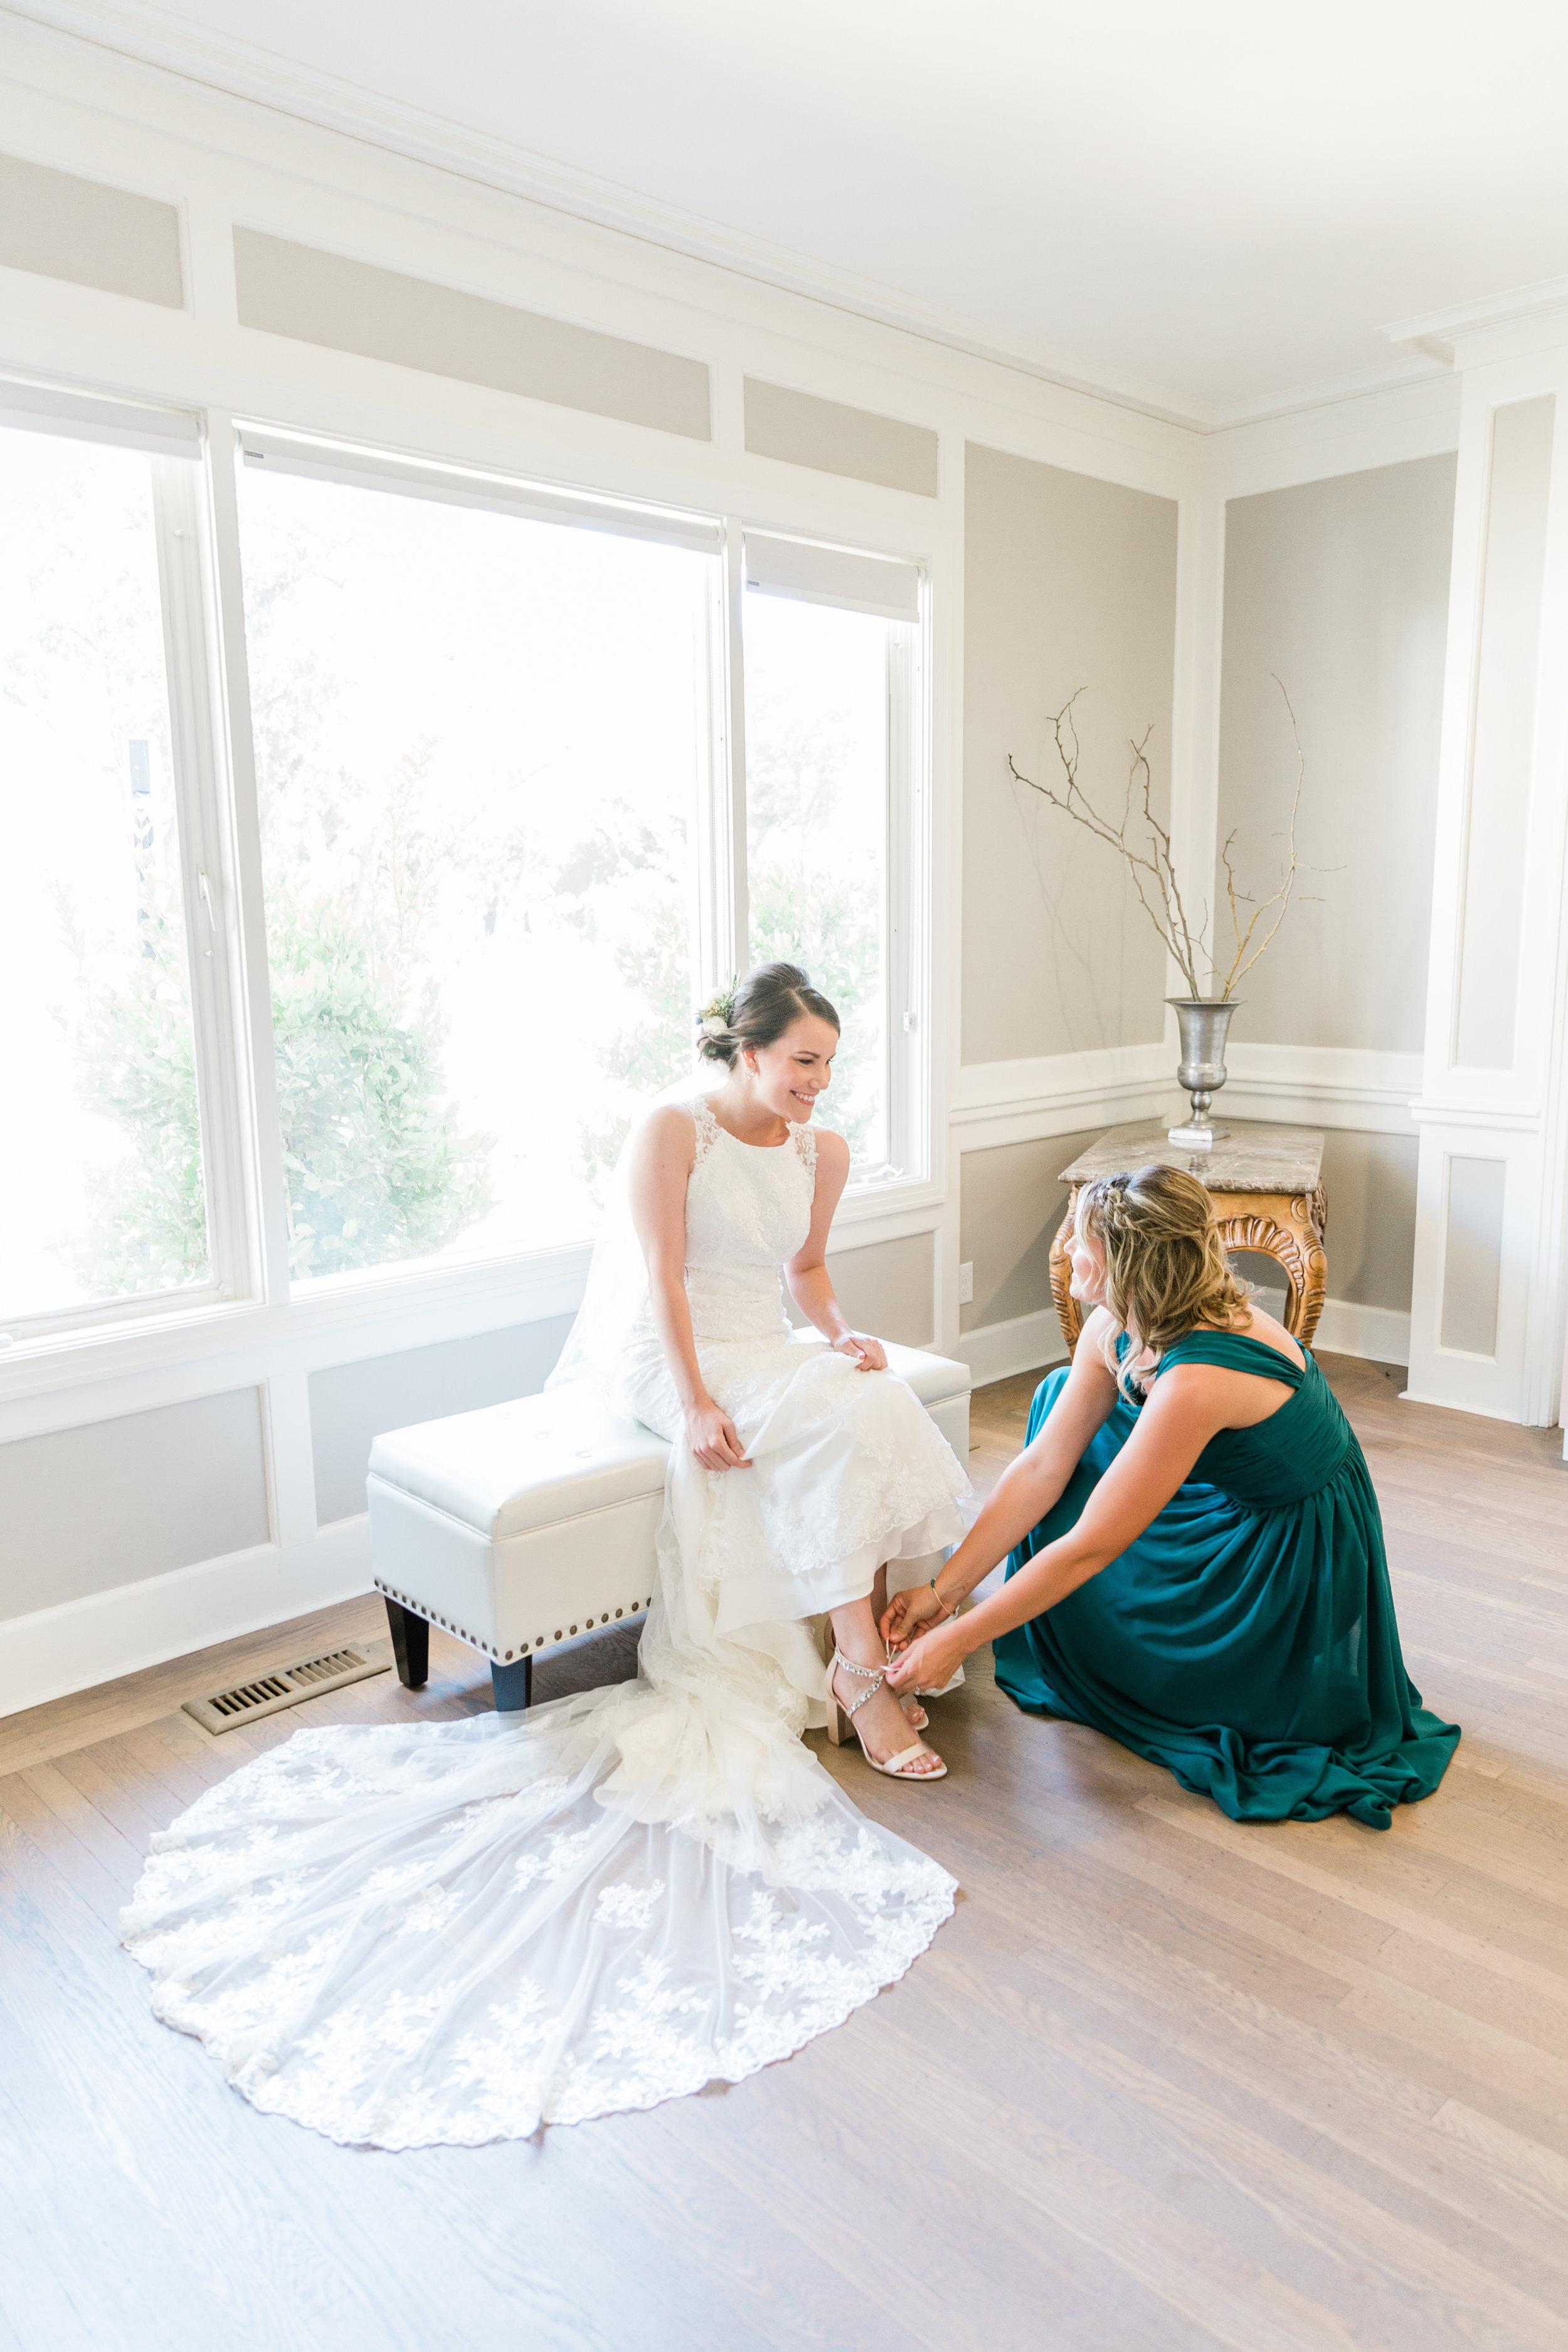 Malorie & Drake - Sneaks - Lauren Alisse Photography-19.jpg